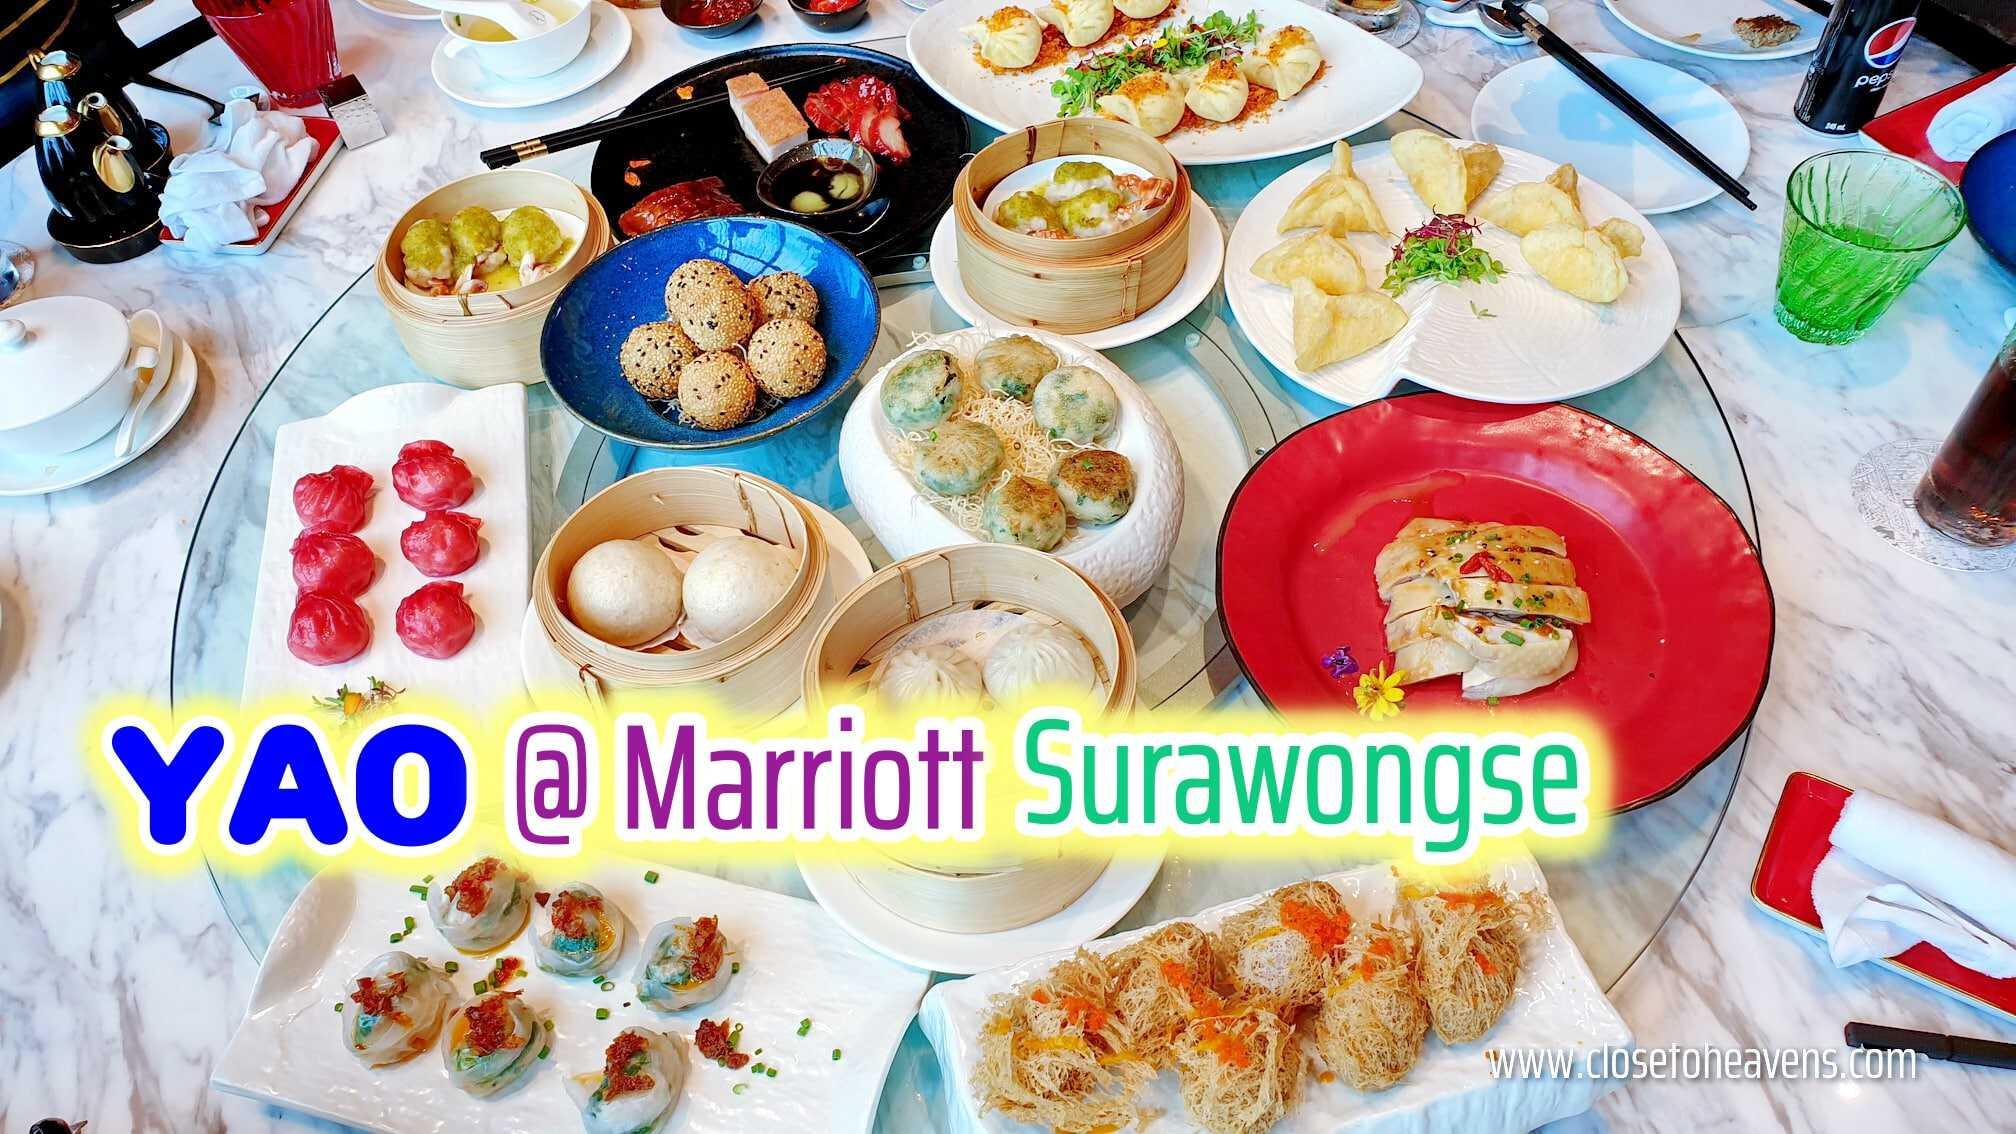 Yao @ Marriott Surawongse   บุฟเฟ่ต์ติ่มซำเฉพาะกิจ